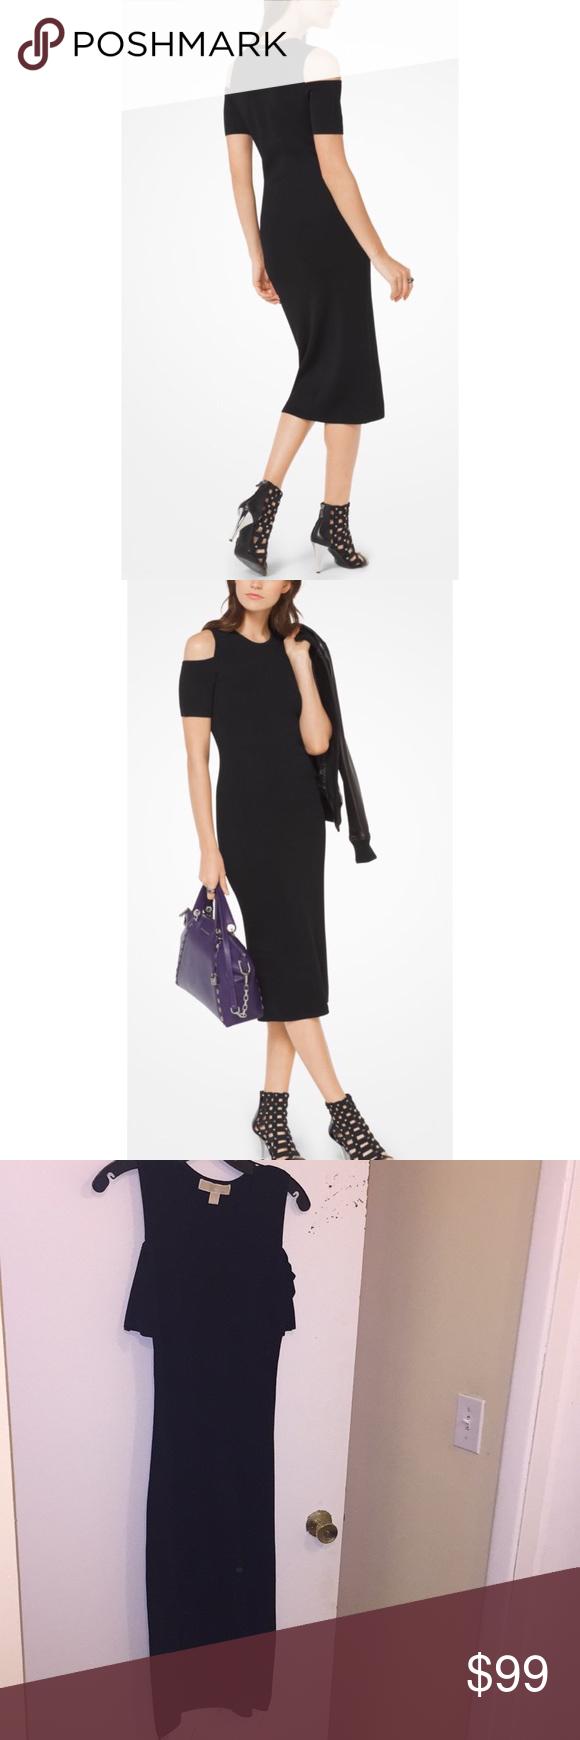 68a56e2579ae Michael Kors Black Midi Dress Stretch-Viscose Peekaboo Midi Dress Style#  MF78WSK5ZV This sophisticated